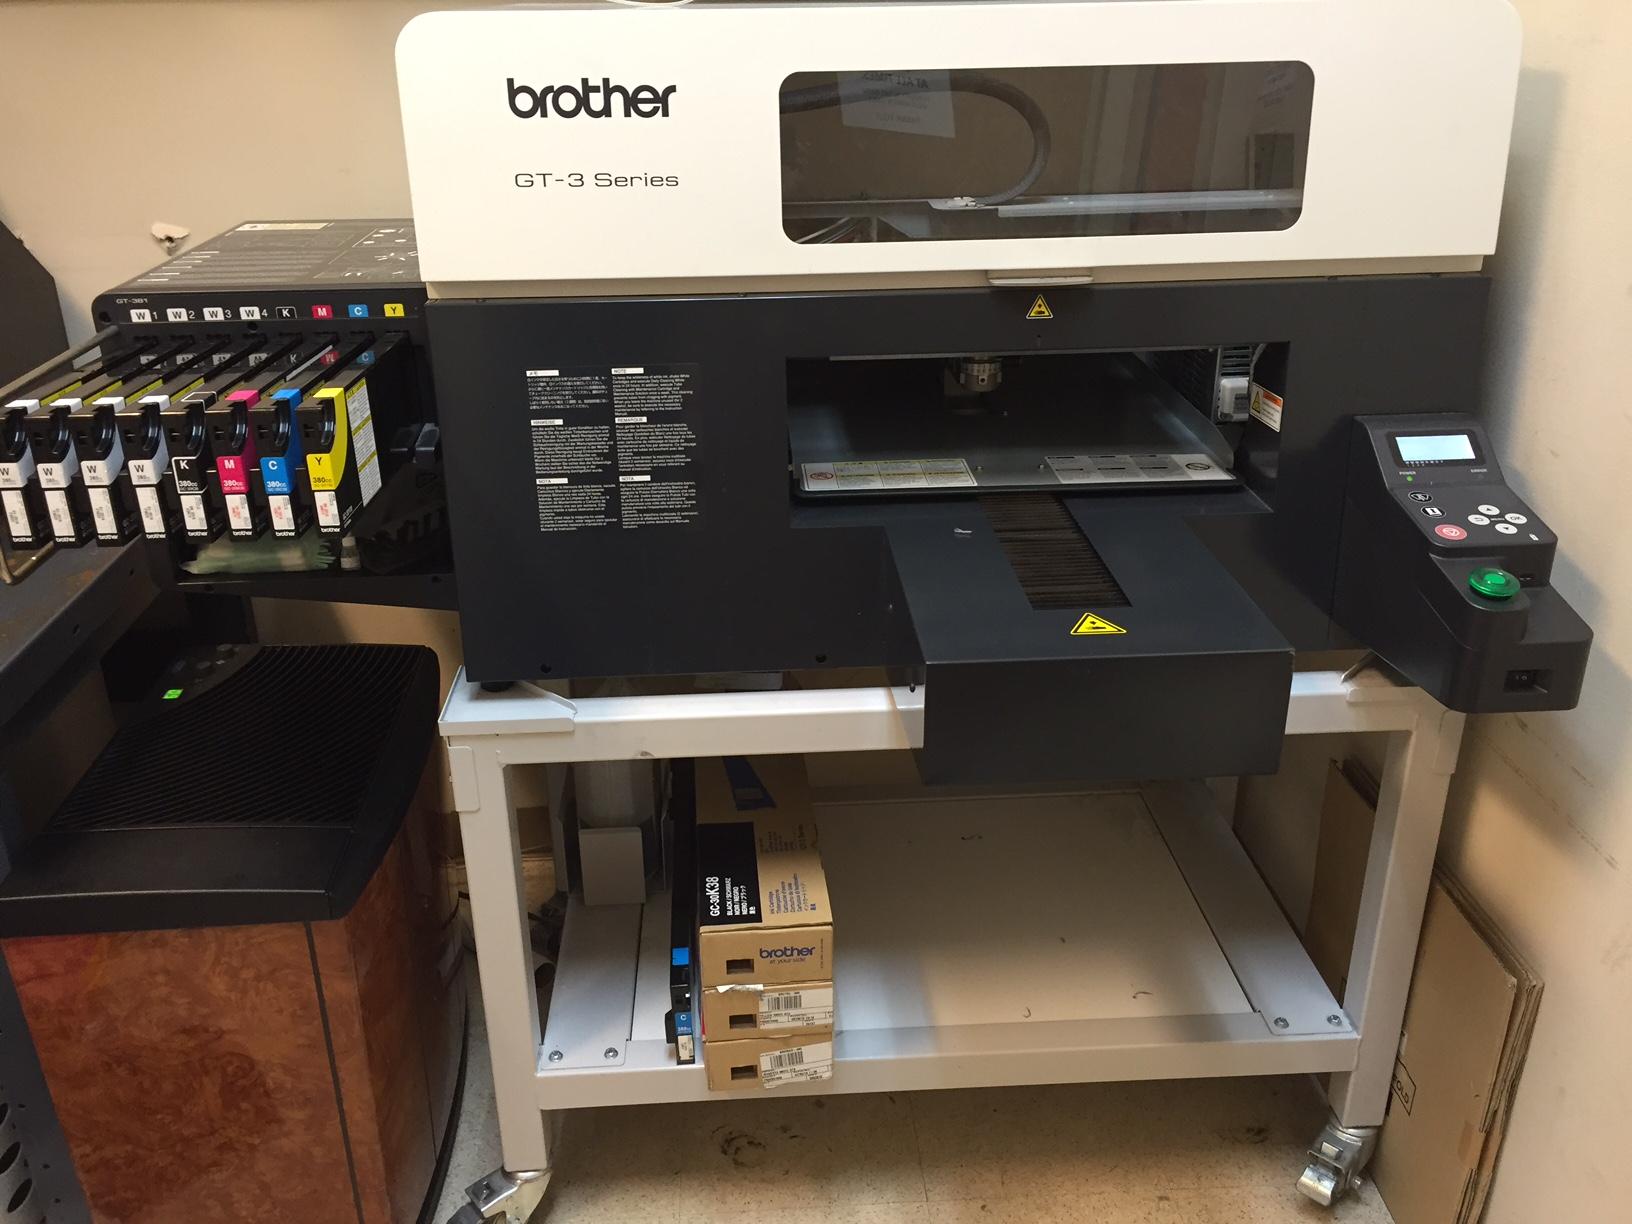 97b919d42 Brother GT-3 Series DTG Printer-image7.jpg